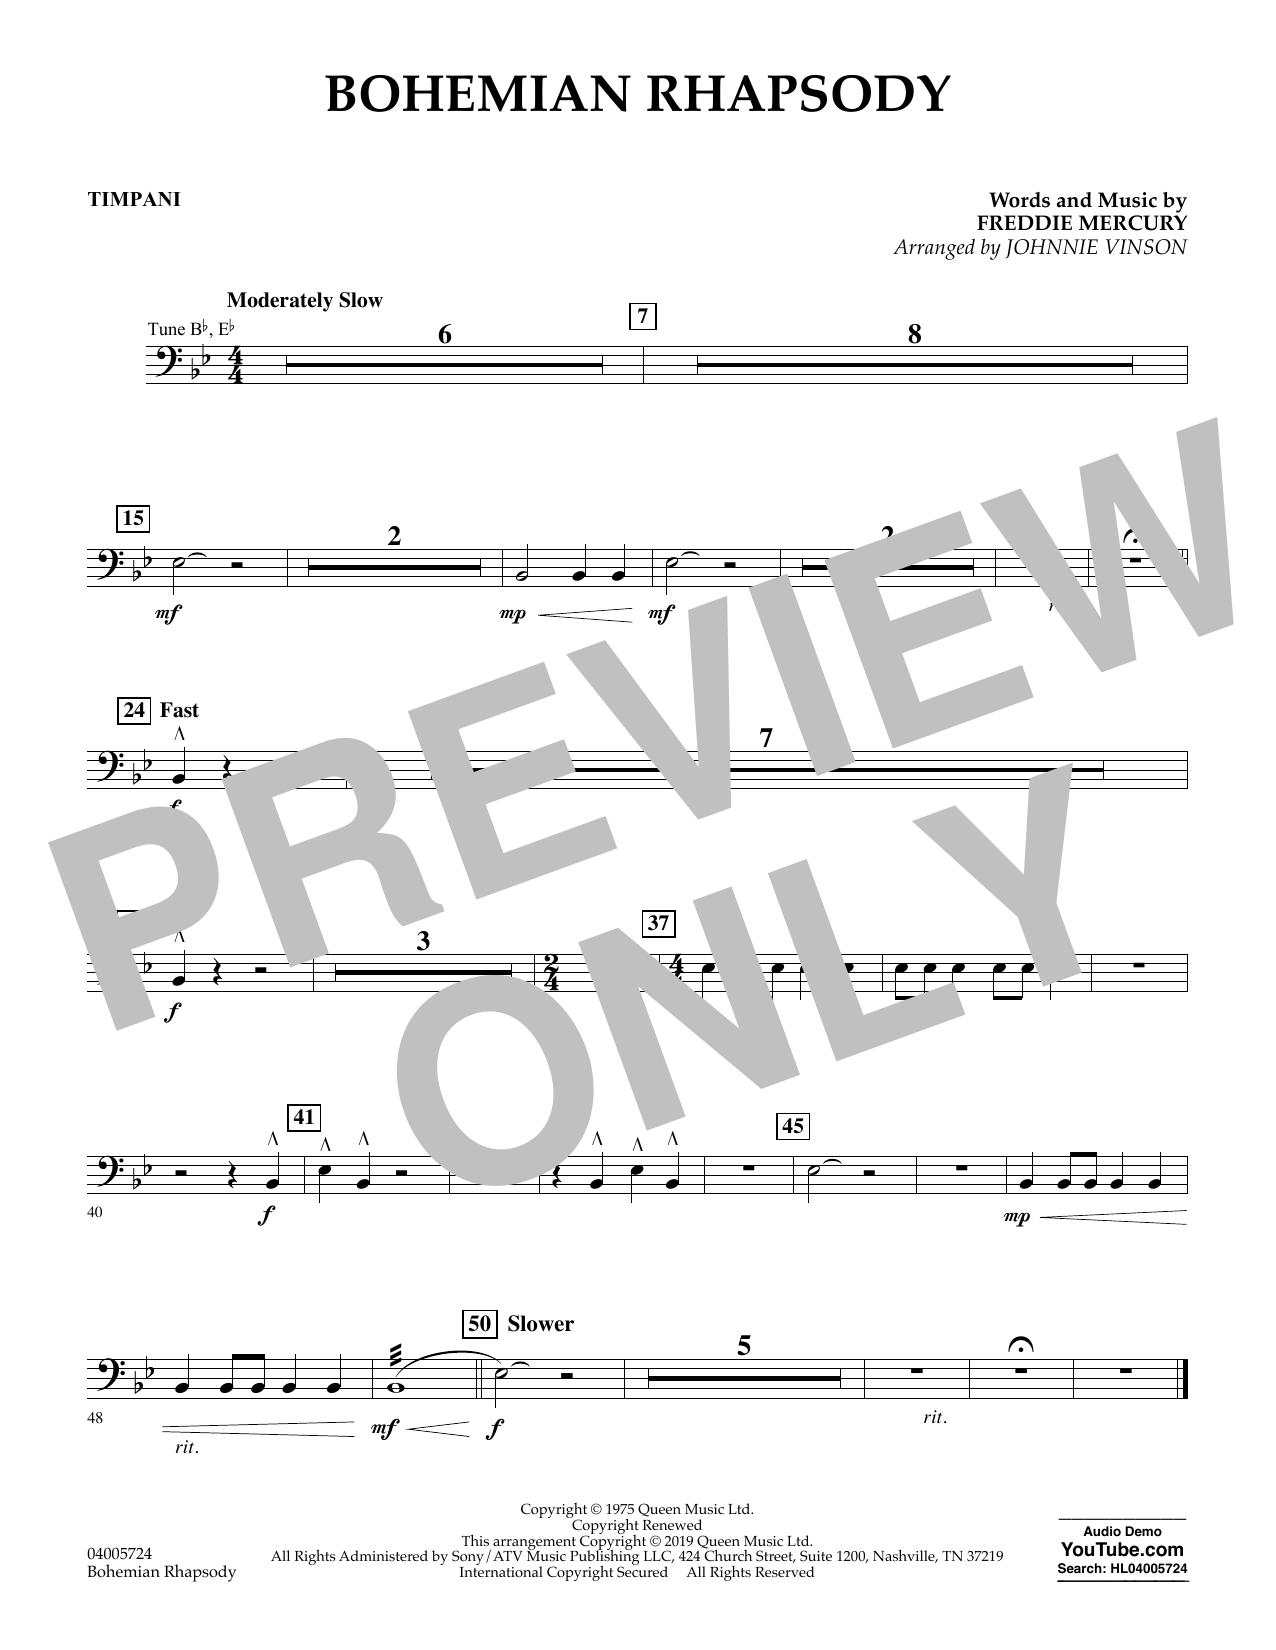 Bohemian Rhapsody (arr. Johnnie Vinson) - Timpani (Concert Band)